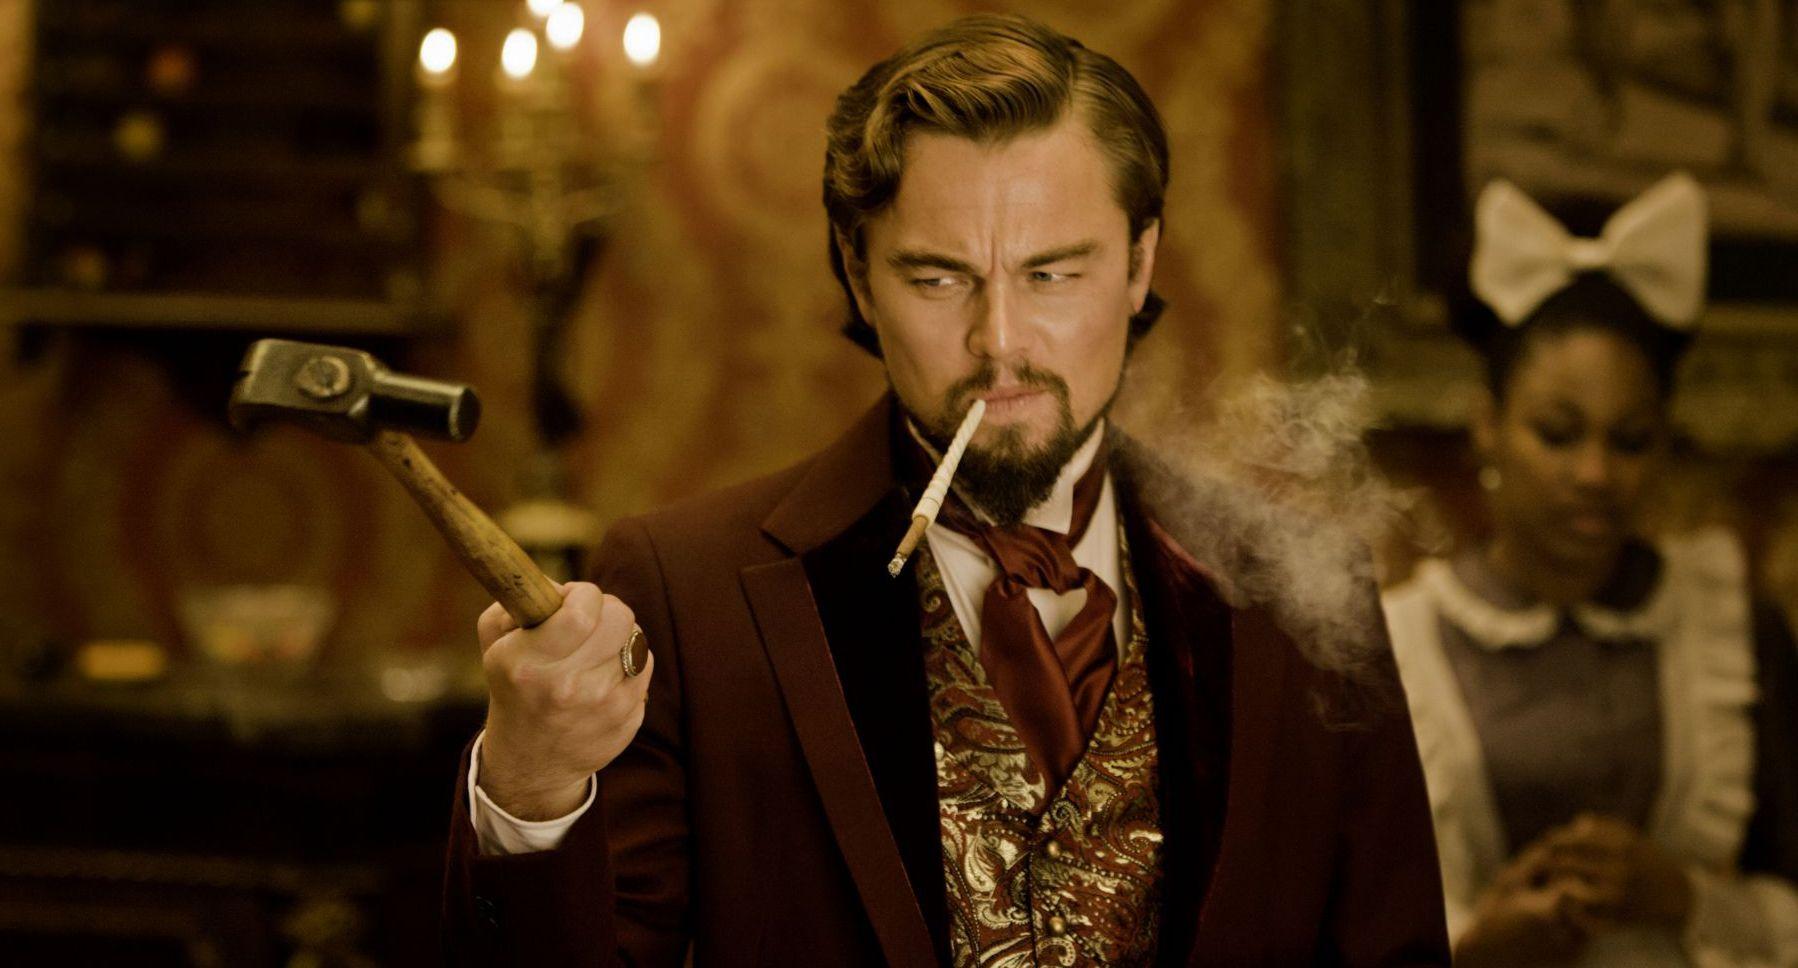 Di Caprio shows a talent for dark comedy in Django Unchained